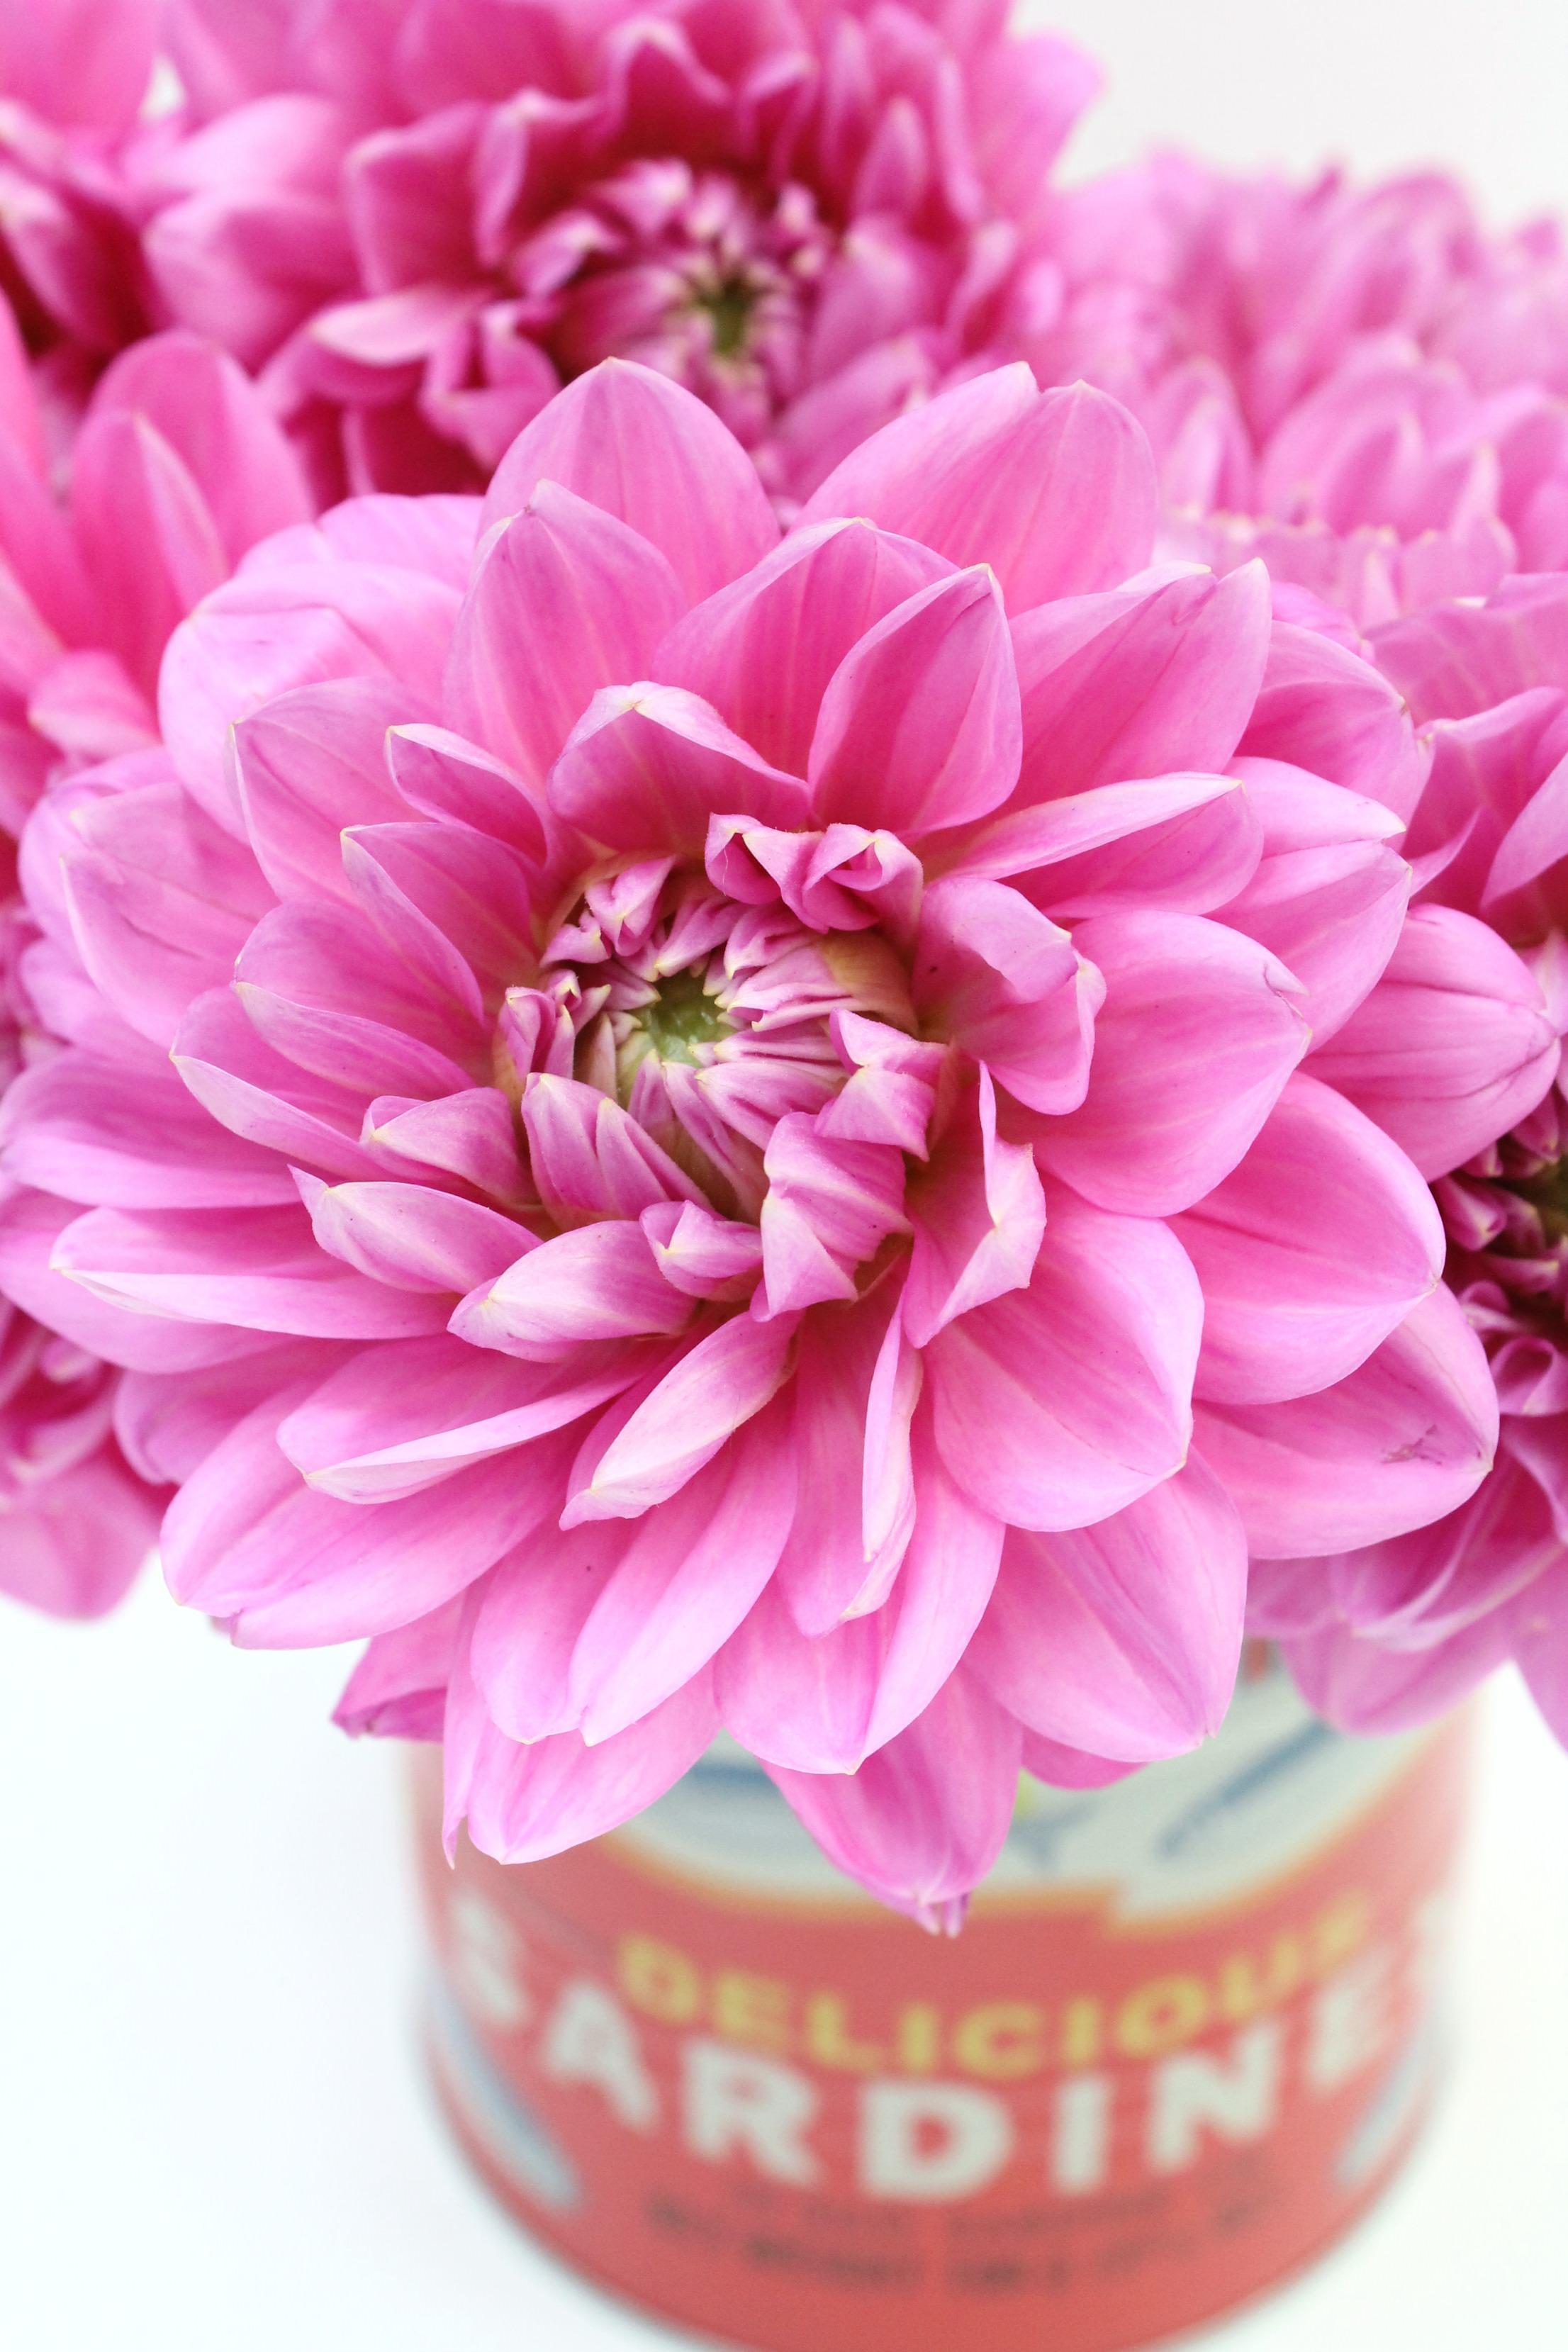 Dahlias-flower-of-the-month-Little-Big-Bell